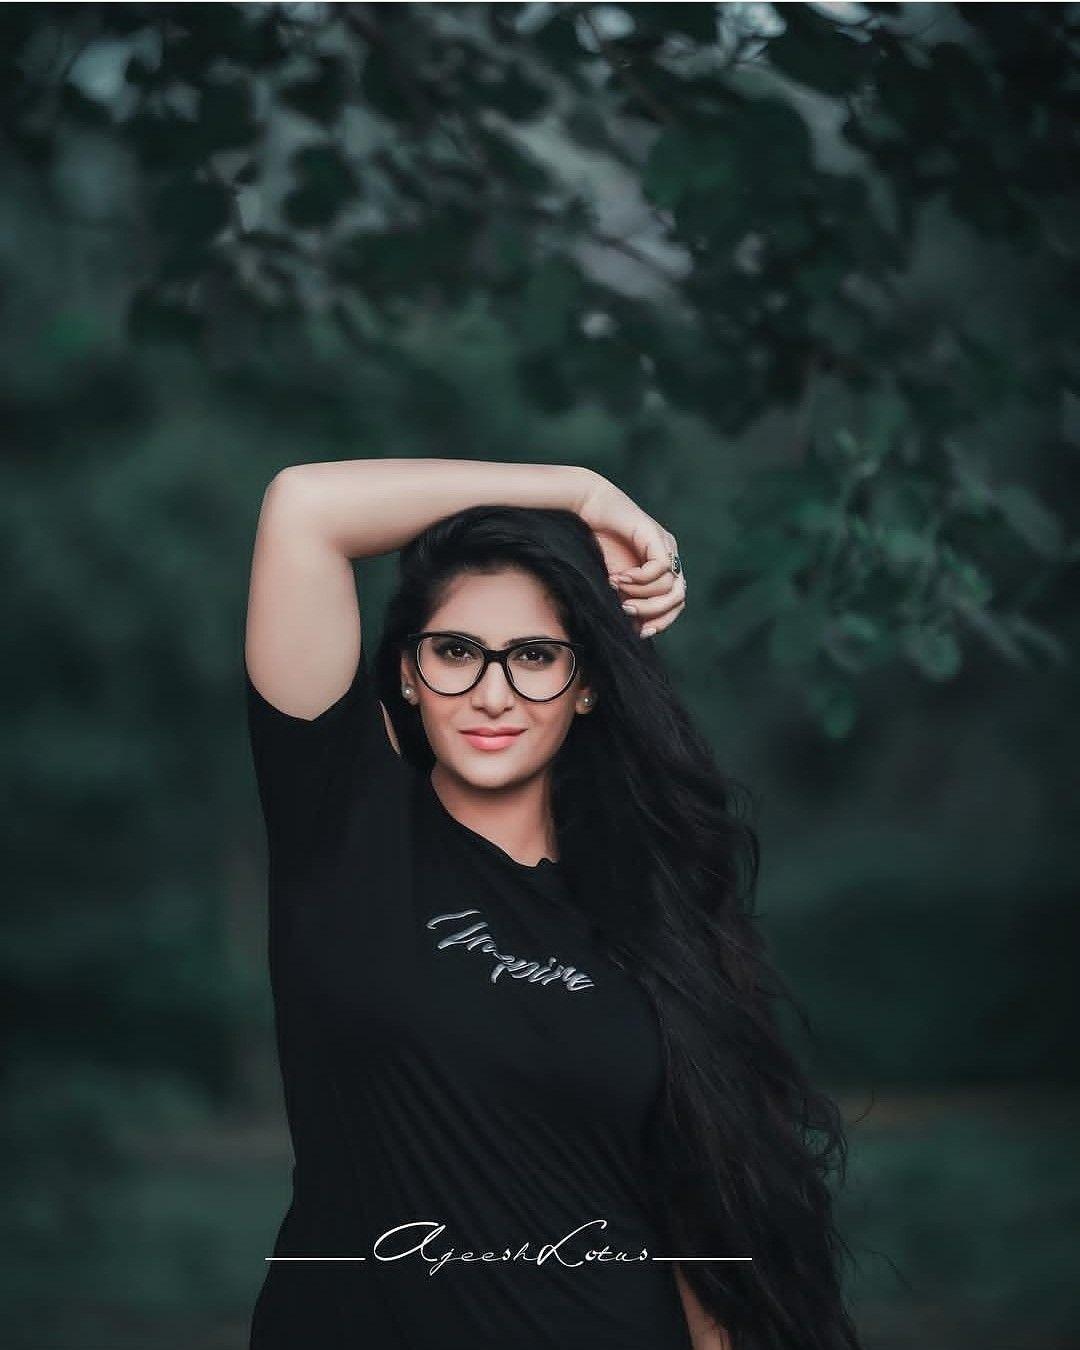 Easy Ladies Hairstyles In Kerala: Pin By Monjenzz Of Kerala 🔵 On Blogging